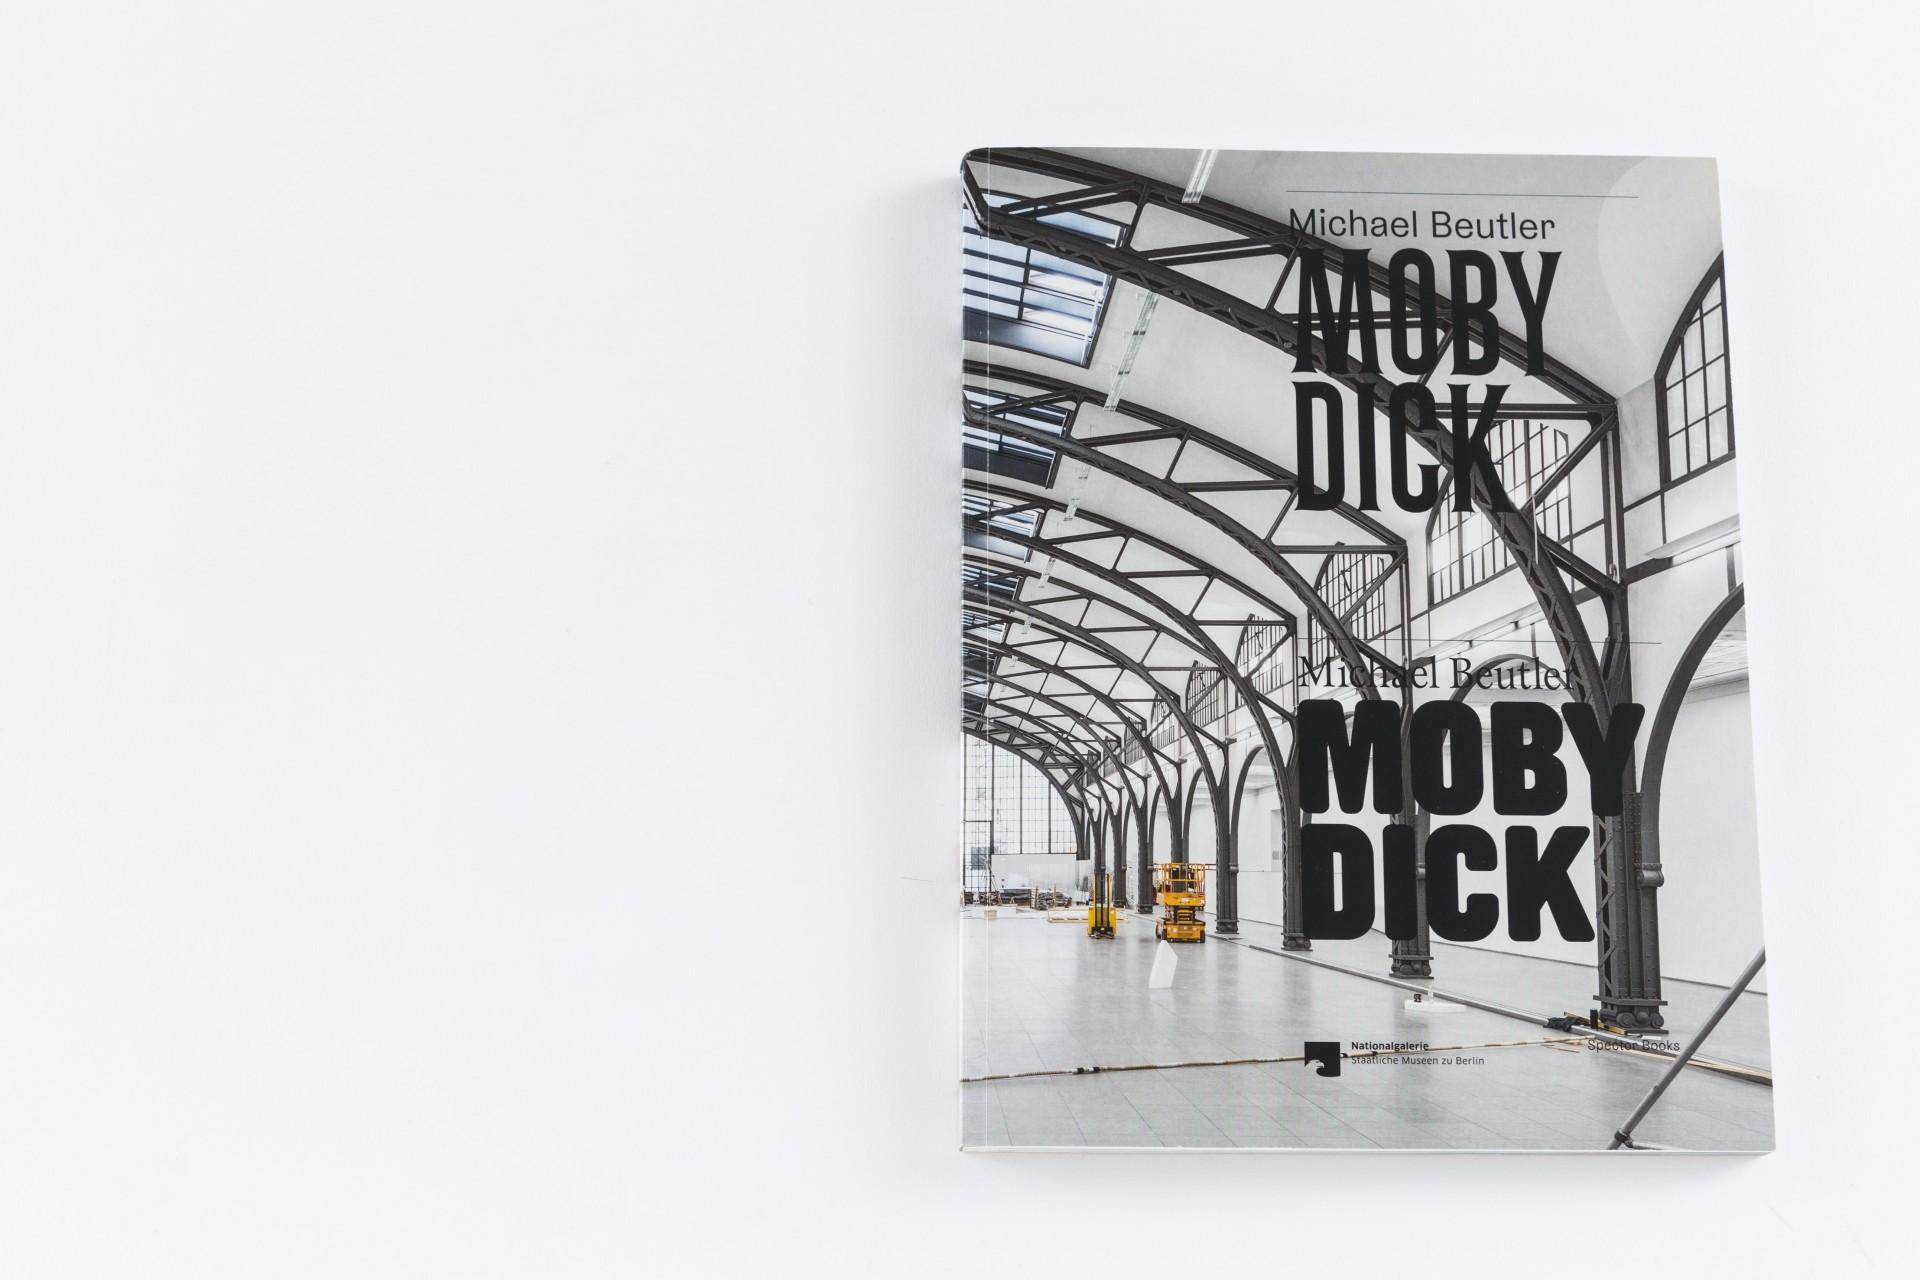 Thomas Bruns Fotografie Moby Dick